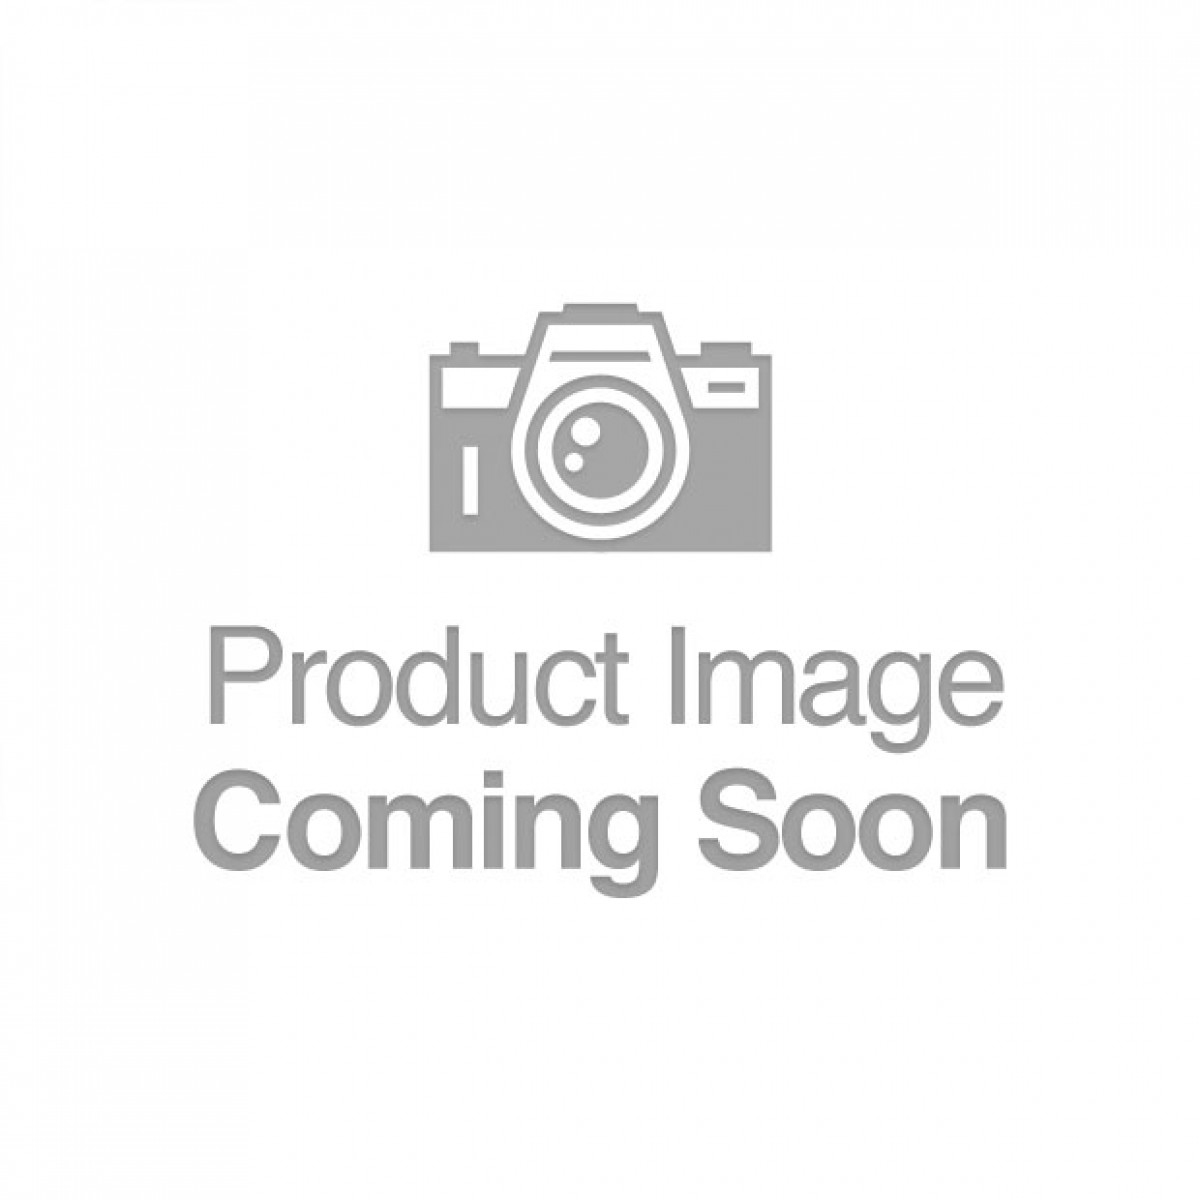 Blush Temptasia Beginner's Clitoral Pumping System - Black